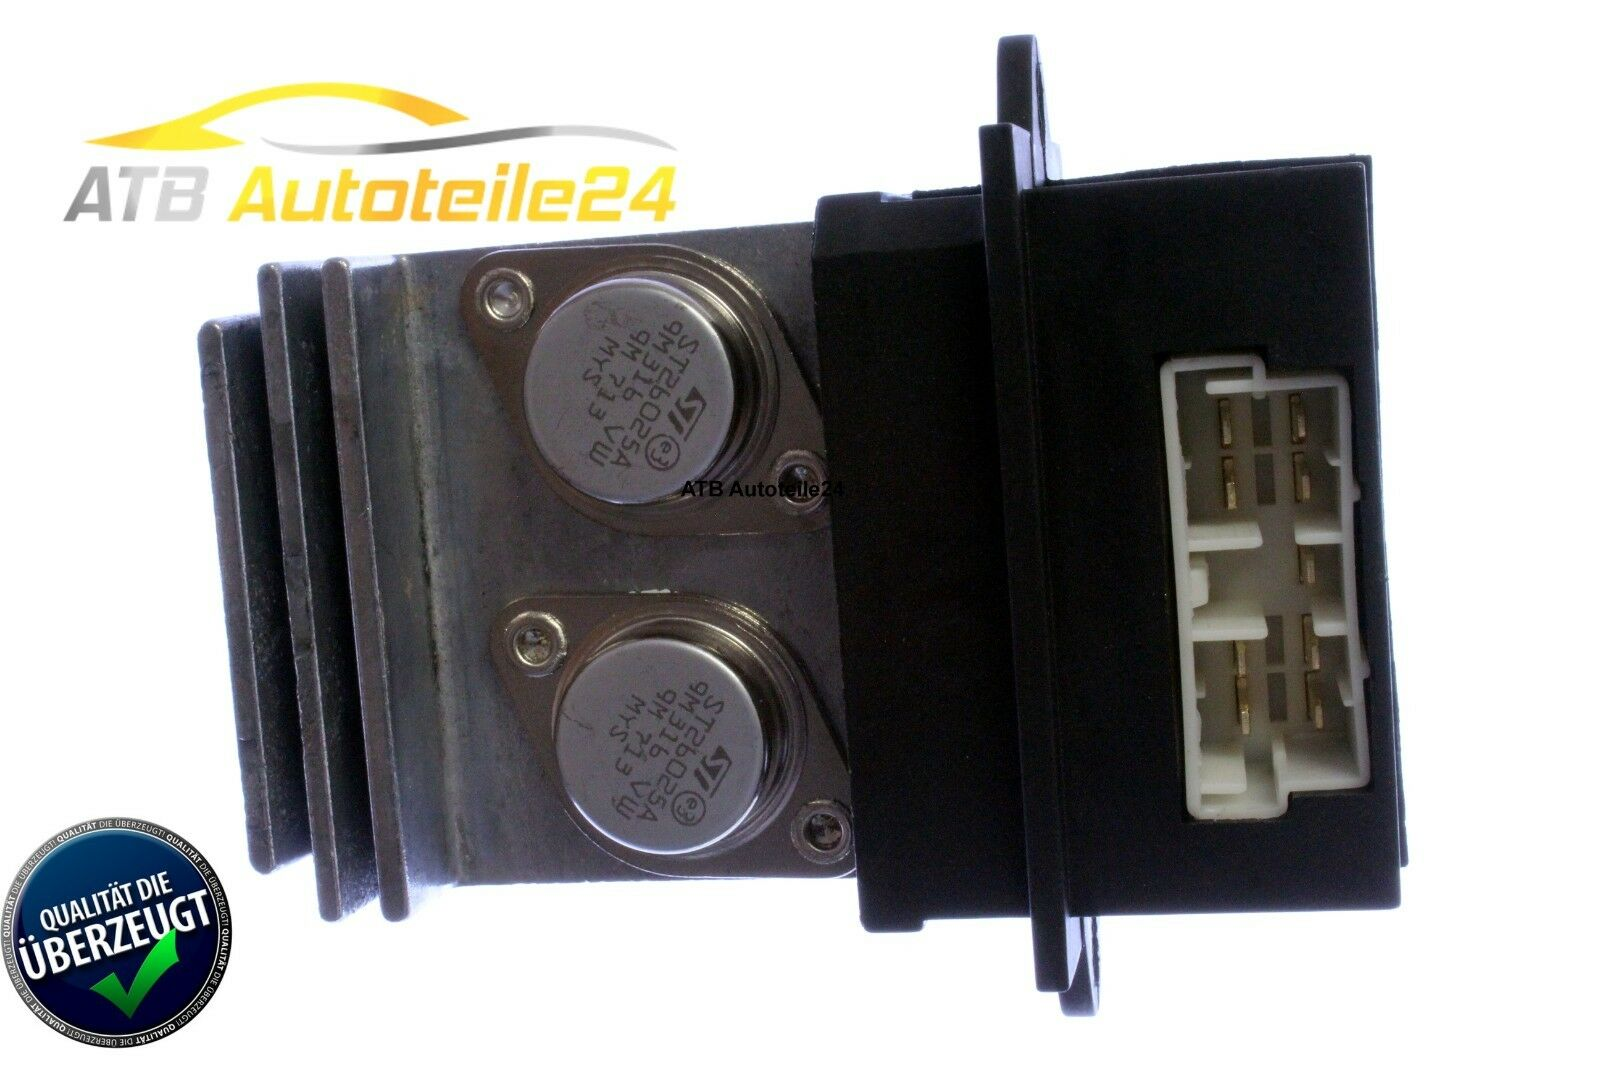 7702206221 Resistance de chauffage RENAULT 19 RENAULT 21 MASTER 2-7701033535